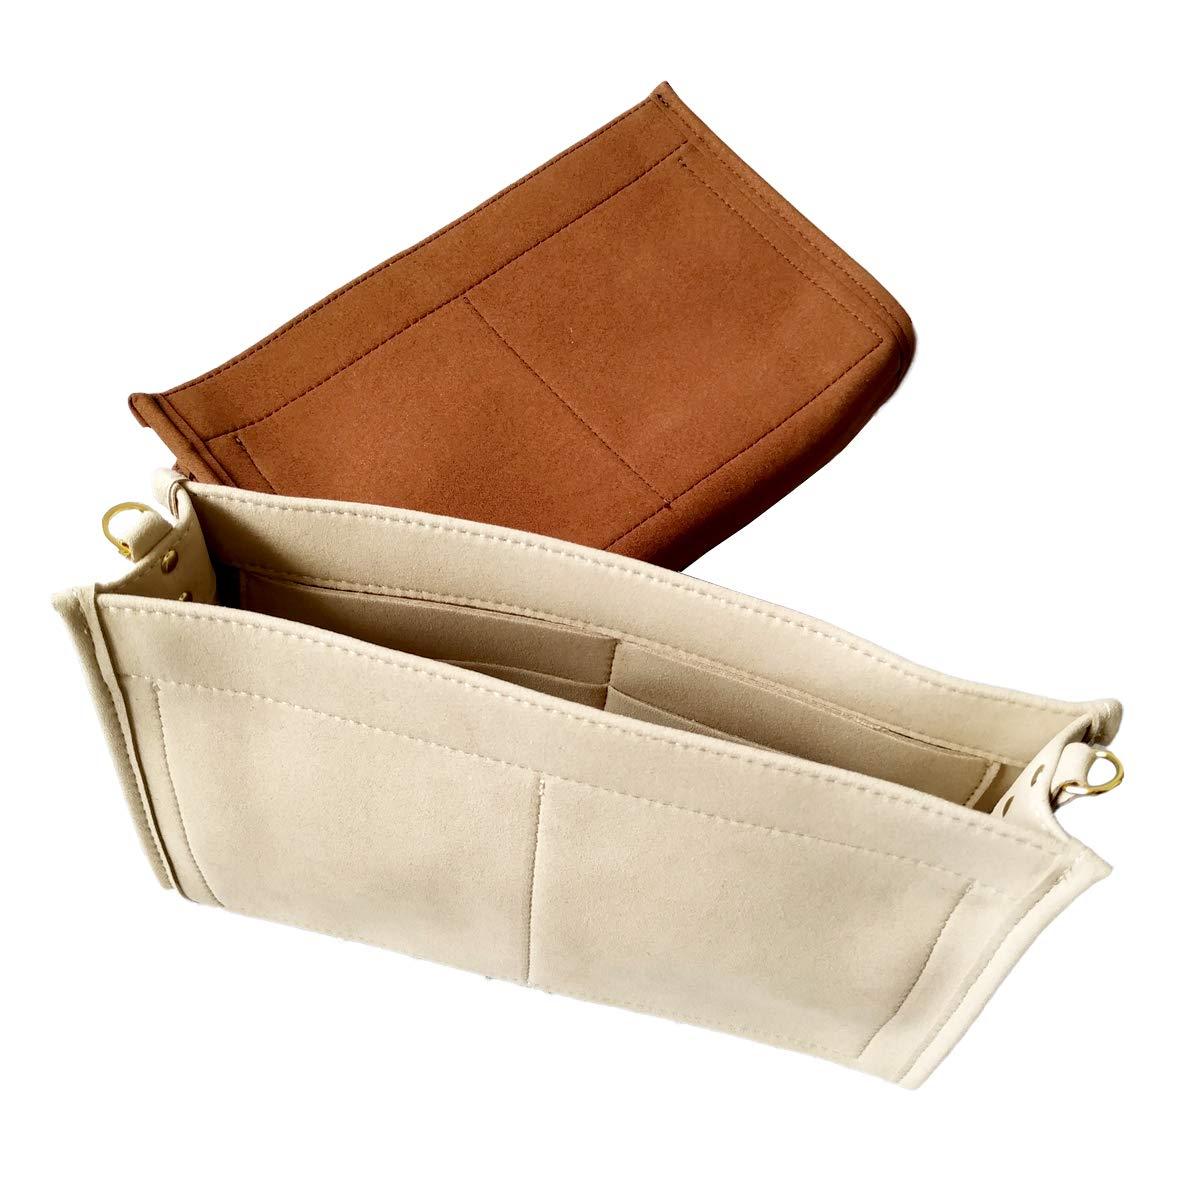 Purse Organizer Insert Fit LV Toiletry Pouch 26 Handbag Shaper Premium Felt with Gold Buckles, Light Khaki (LV Toiletry Pouch 26, Light Khaki) by CLYDD